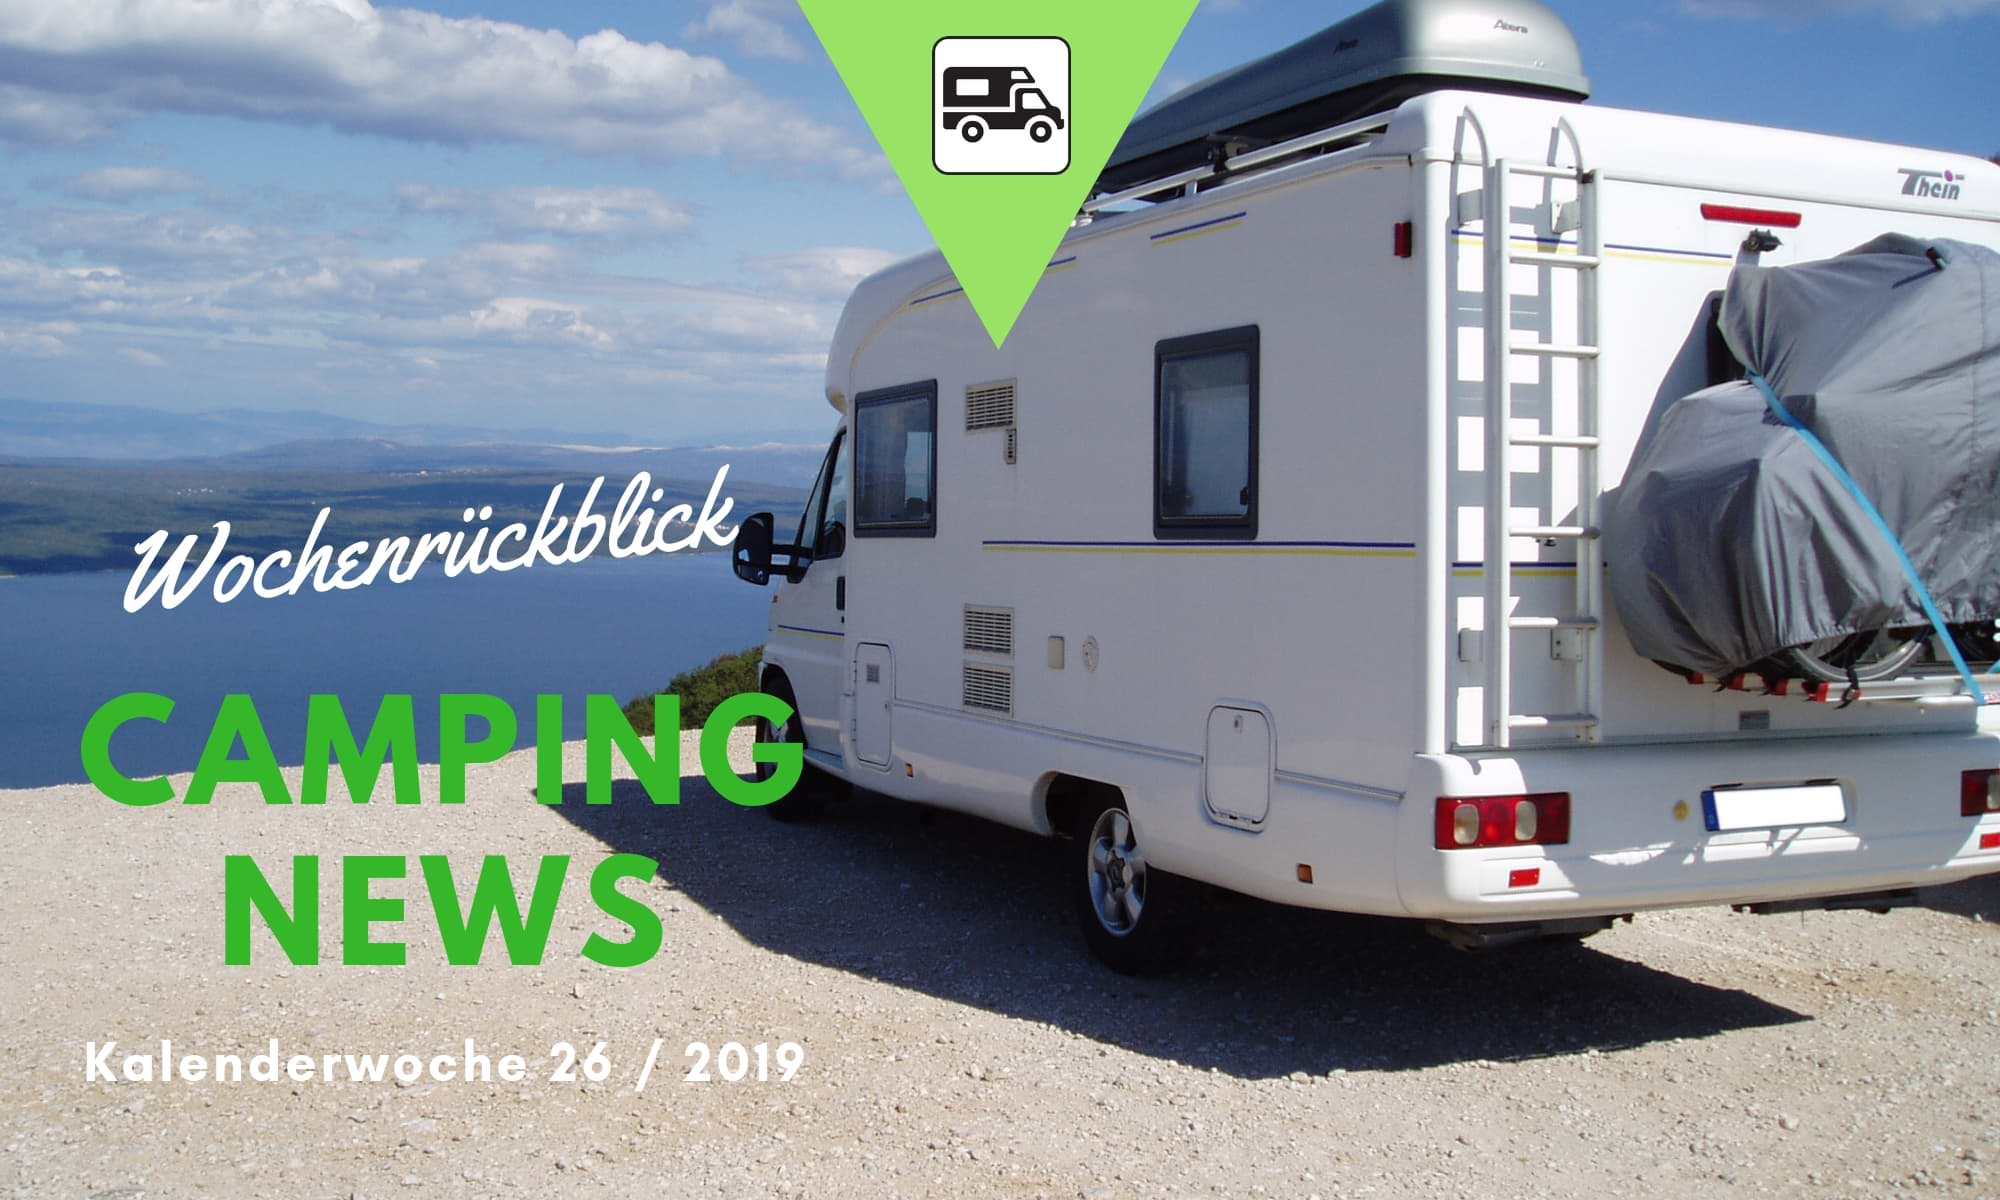 Wochenrückblick Camping News KW26-2019